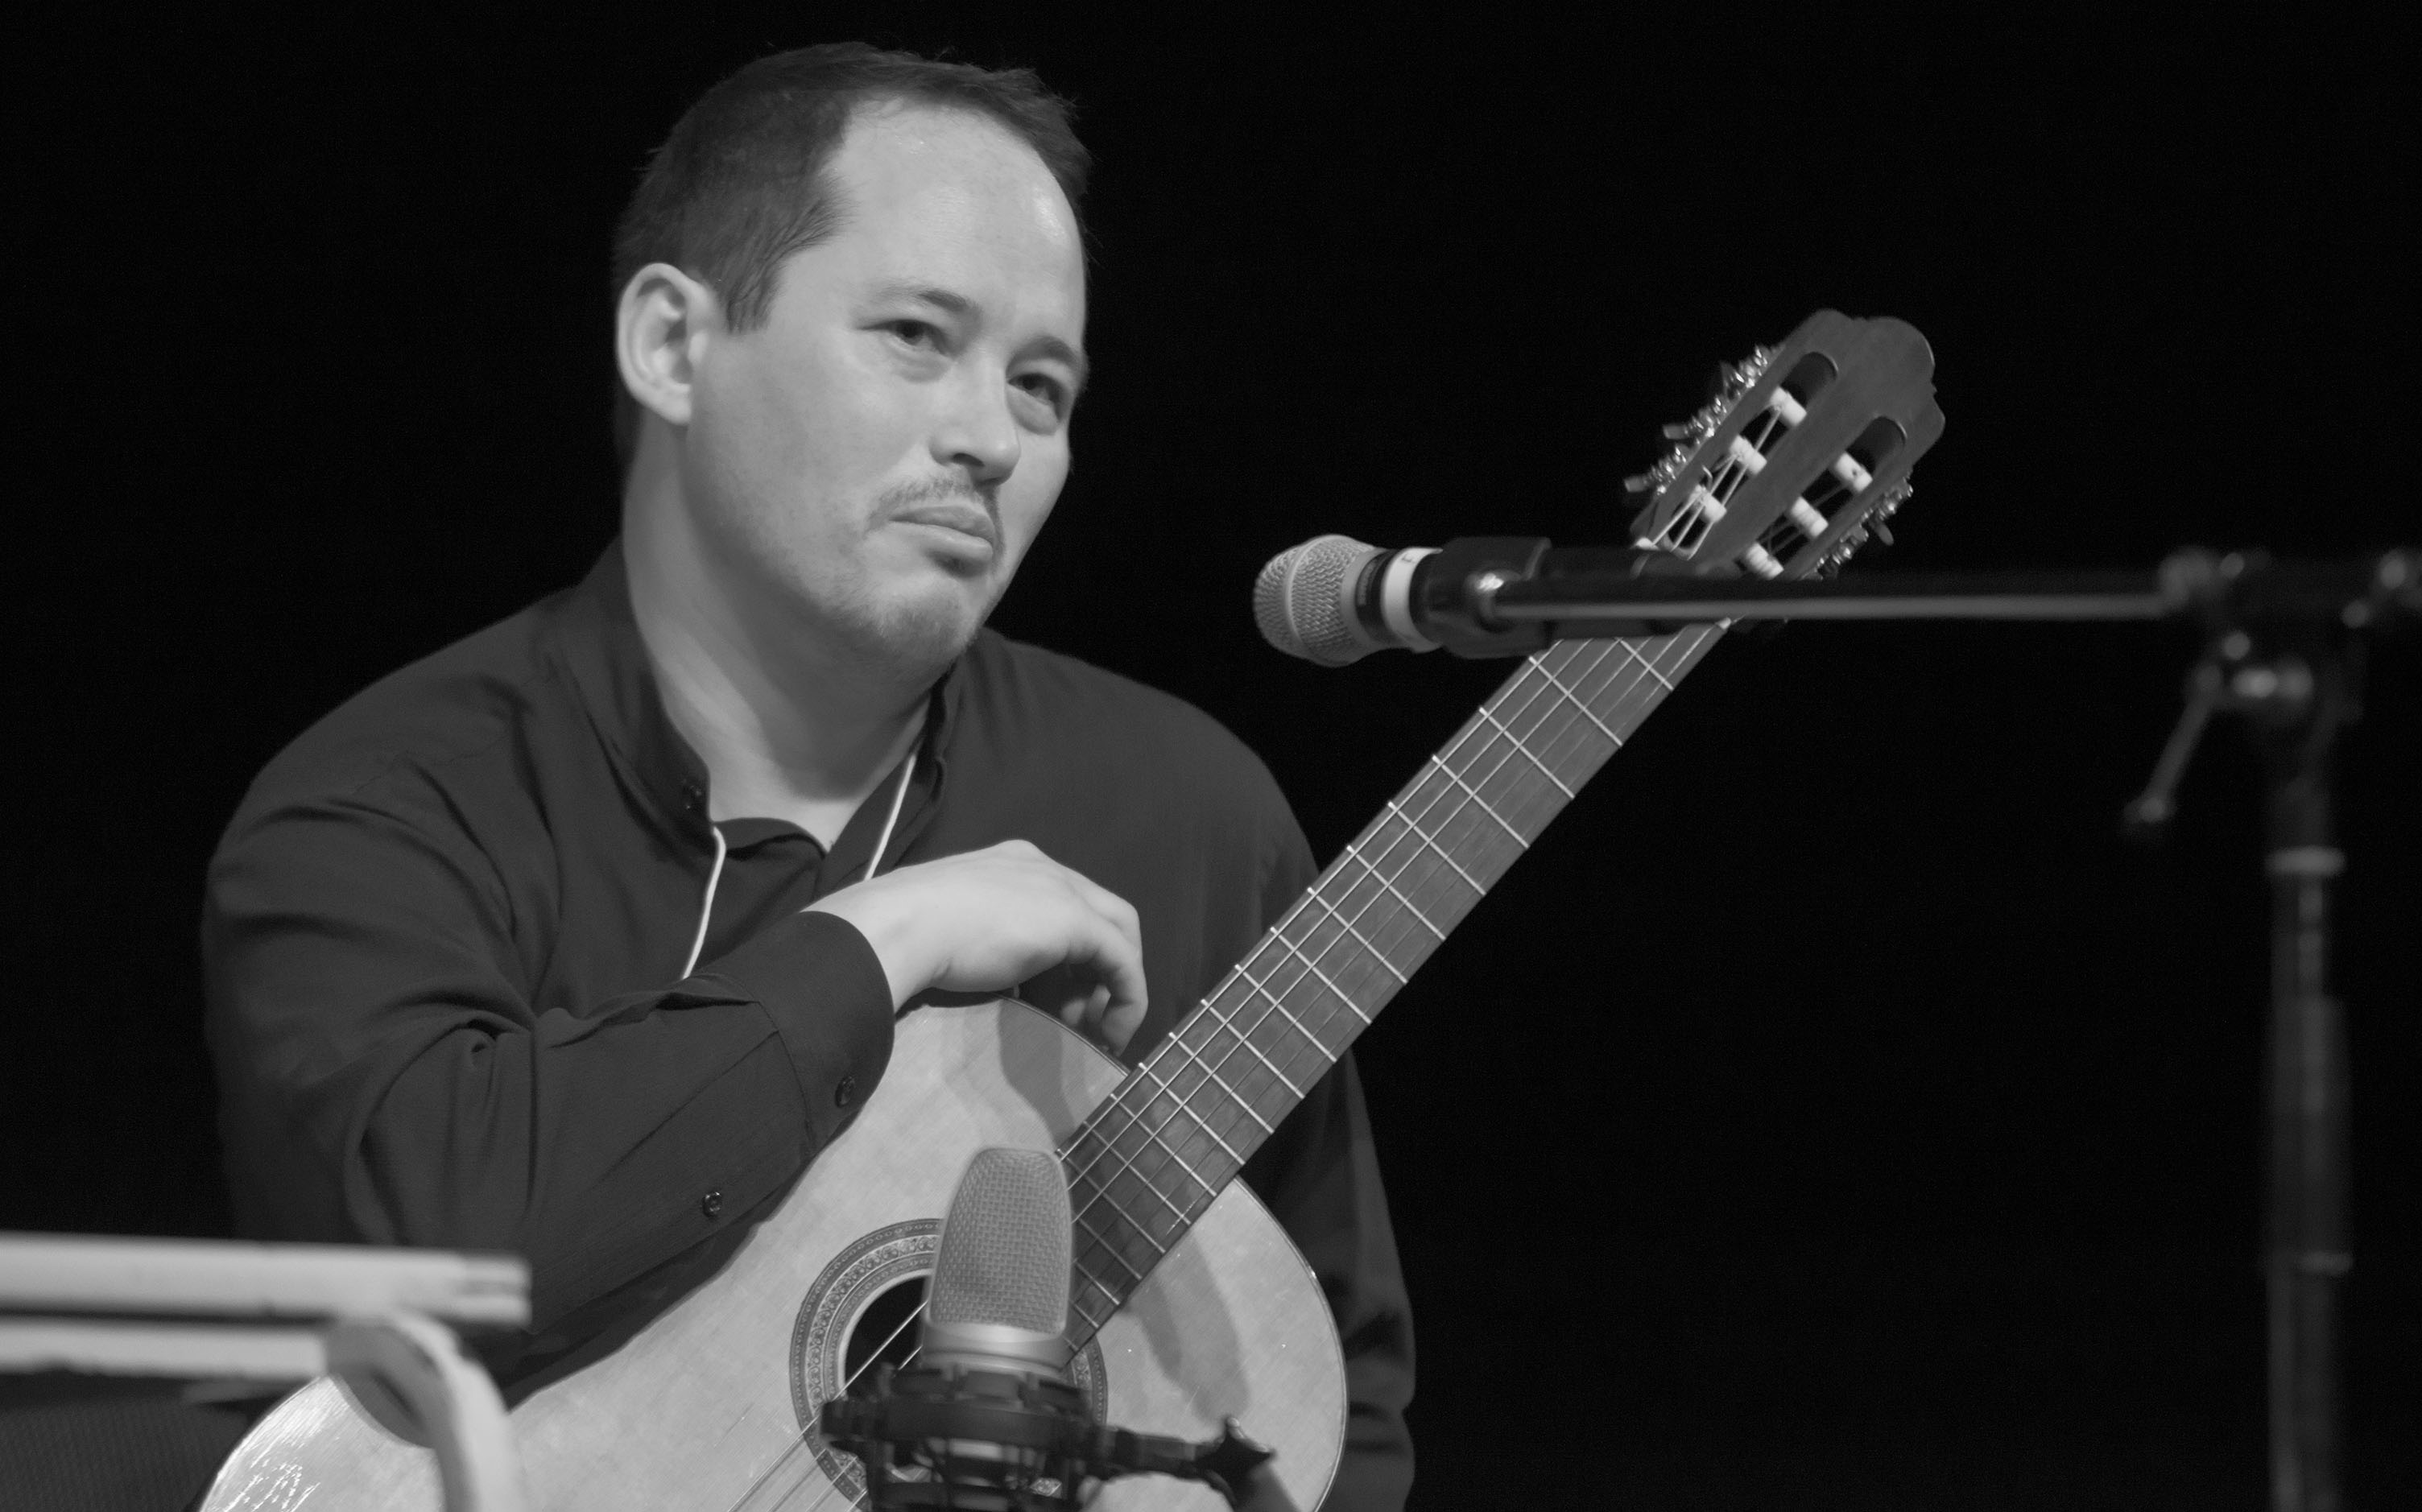 Andrew mah workshop, guitarnow! 2013